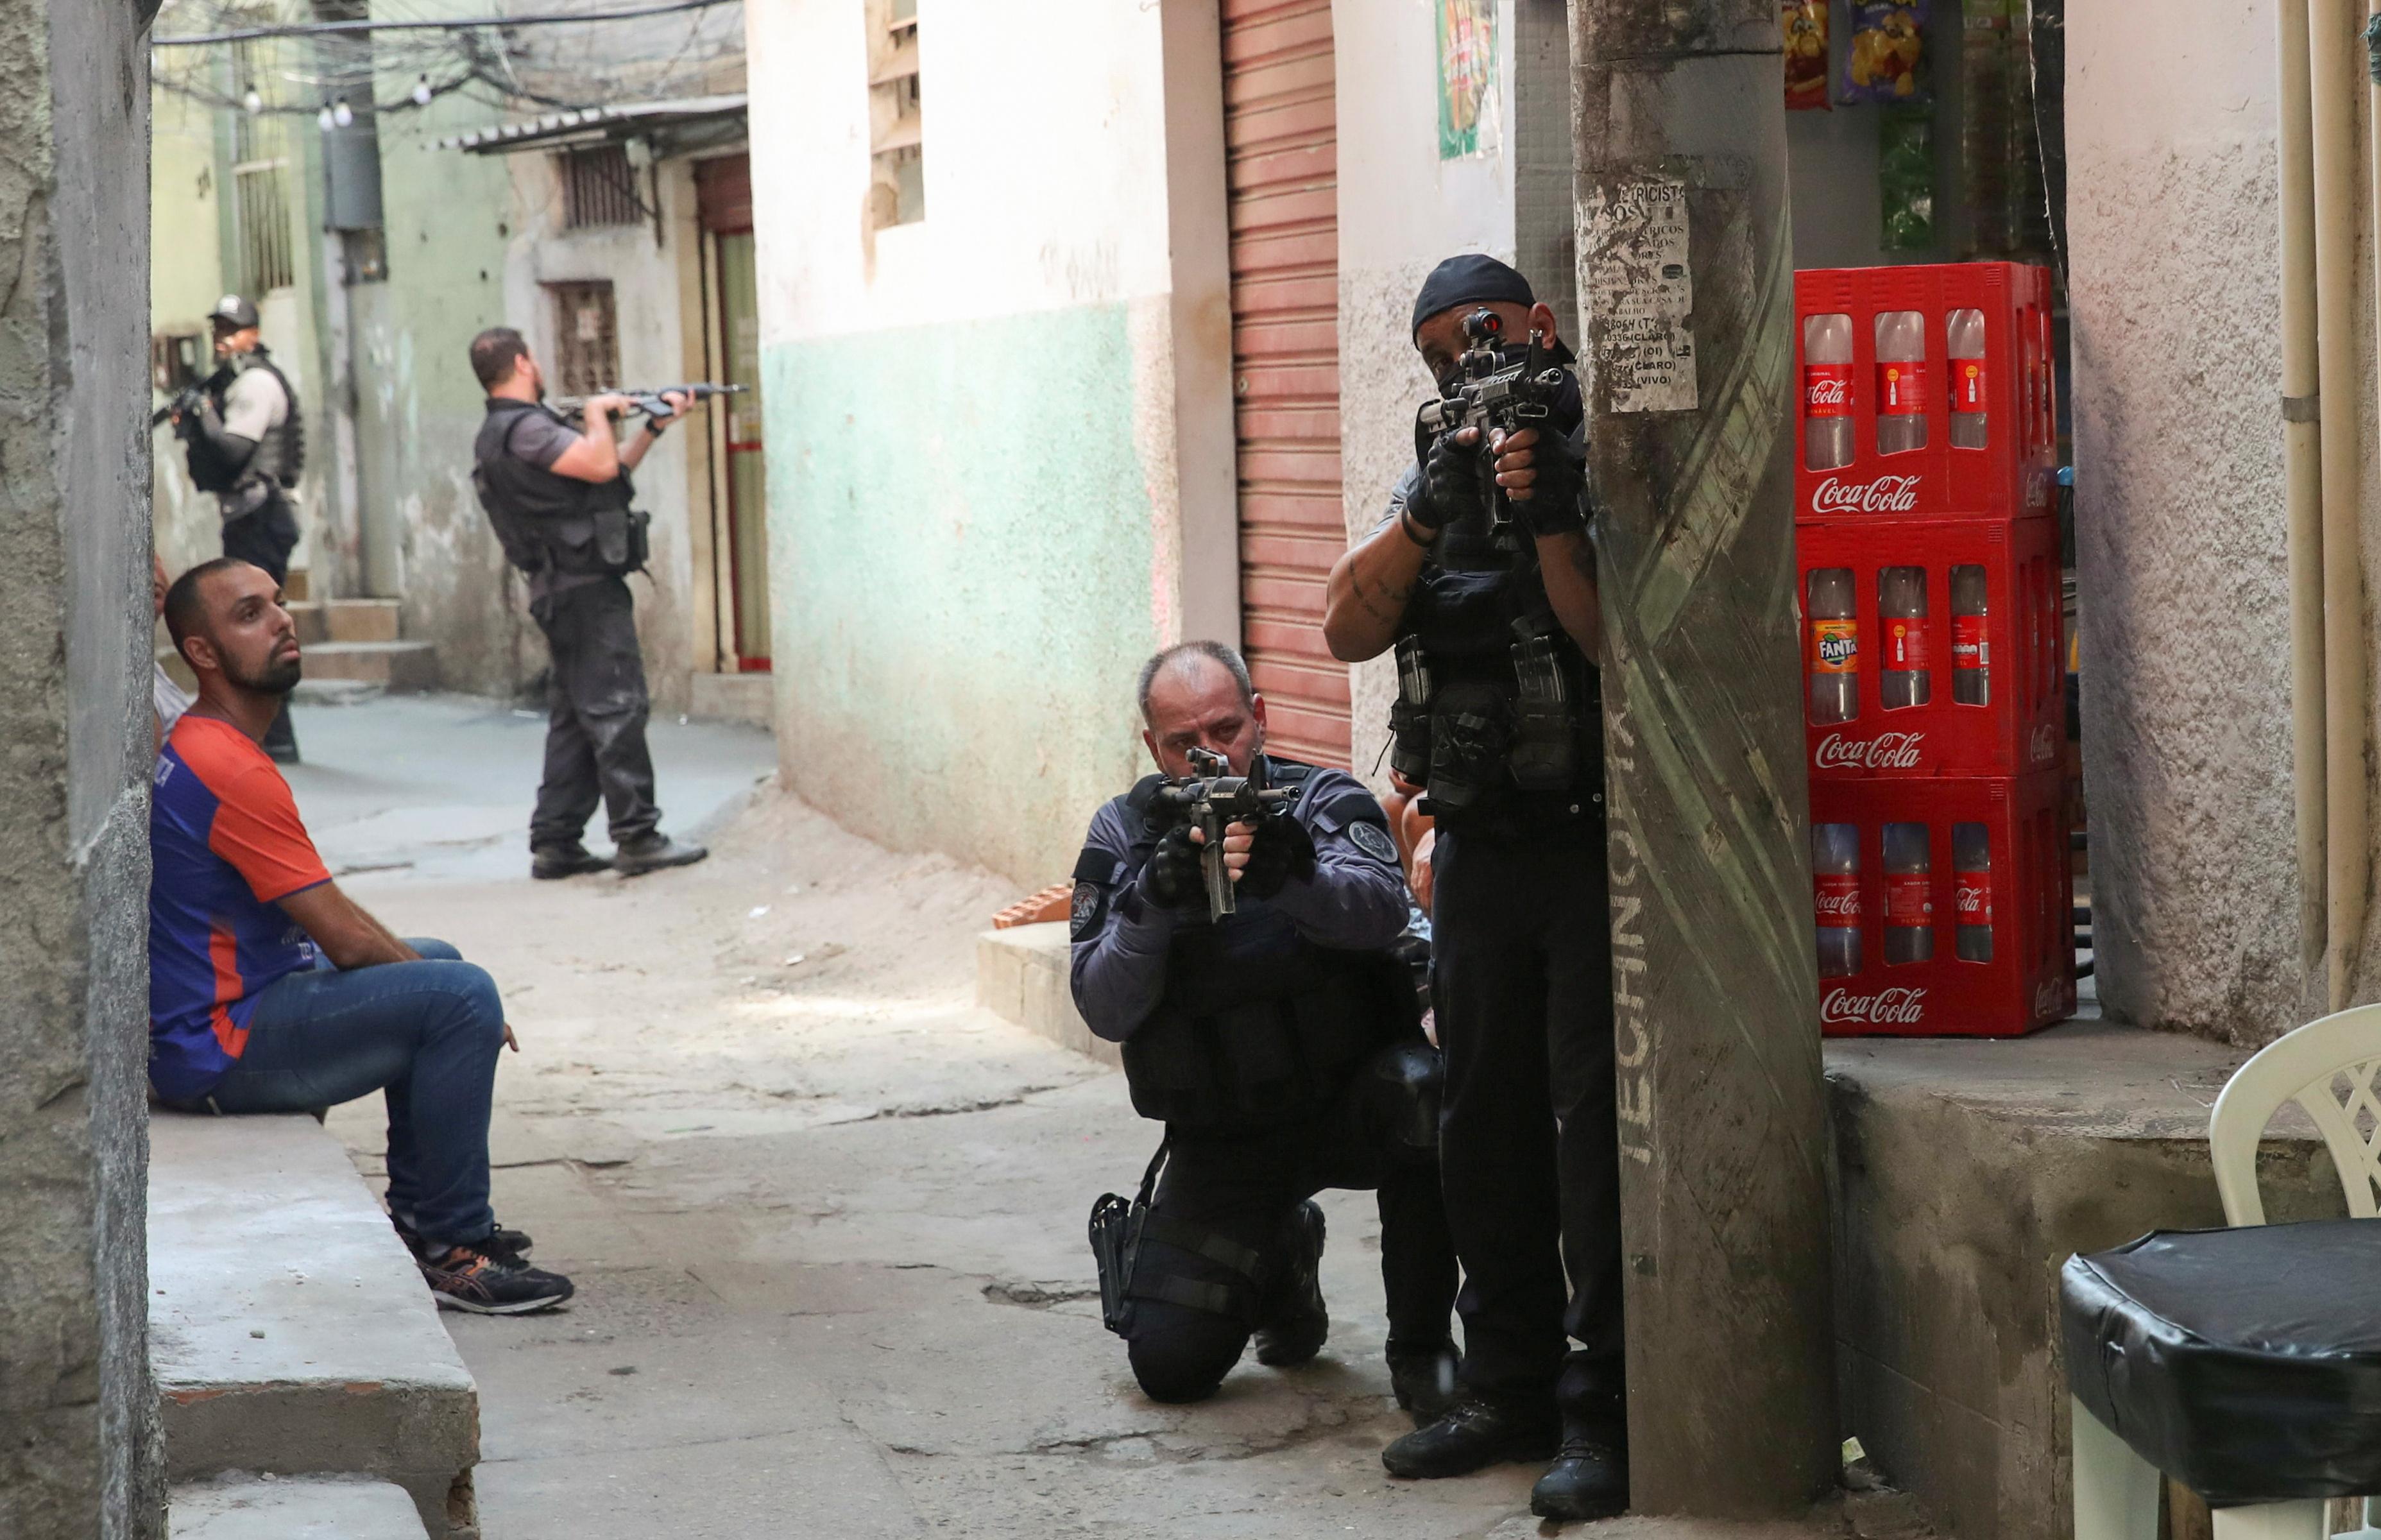 Policemen aim their weapons during an operation against drug dealers in Jacarezinho slum in Rio de Janeiro, Brazil May 6, 2021. REUTERS/Ricardo Moraes